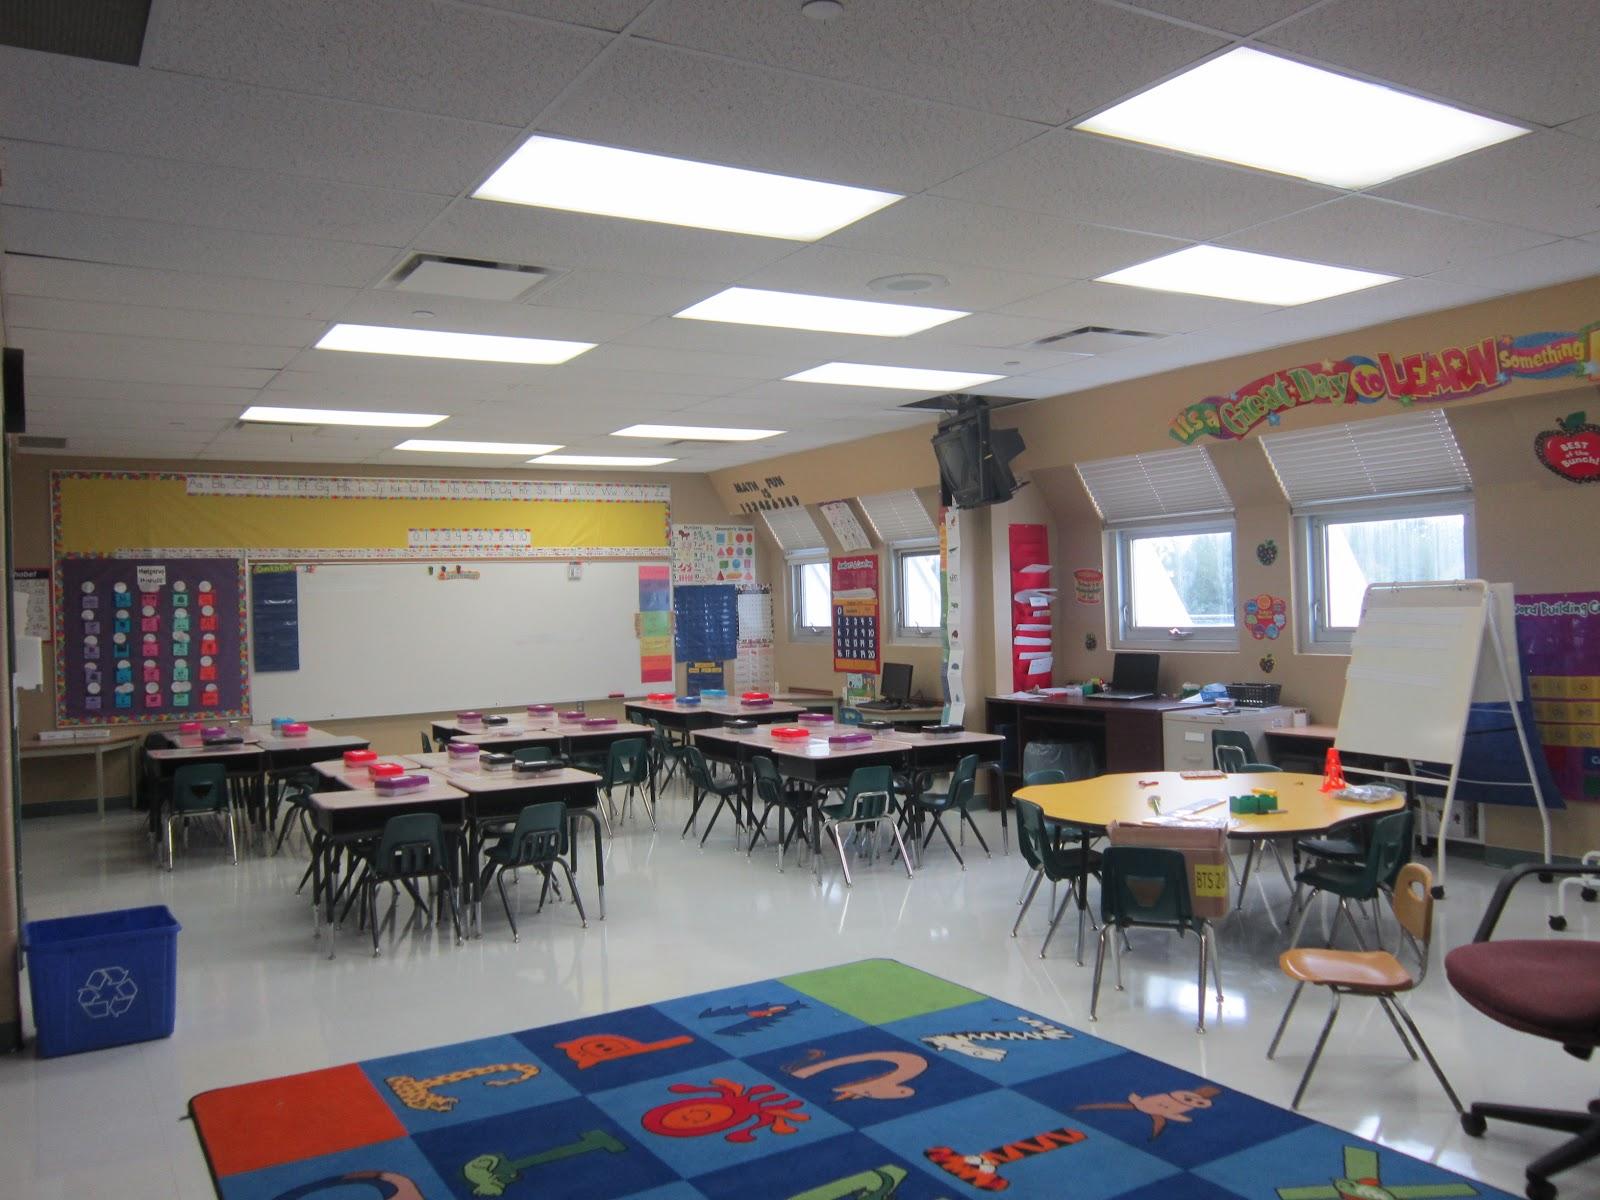 egitimteknolojinet_classroom_decoration (6)